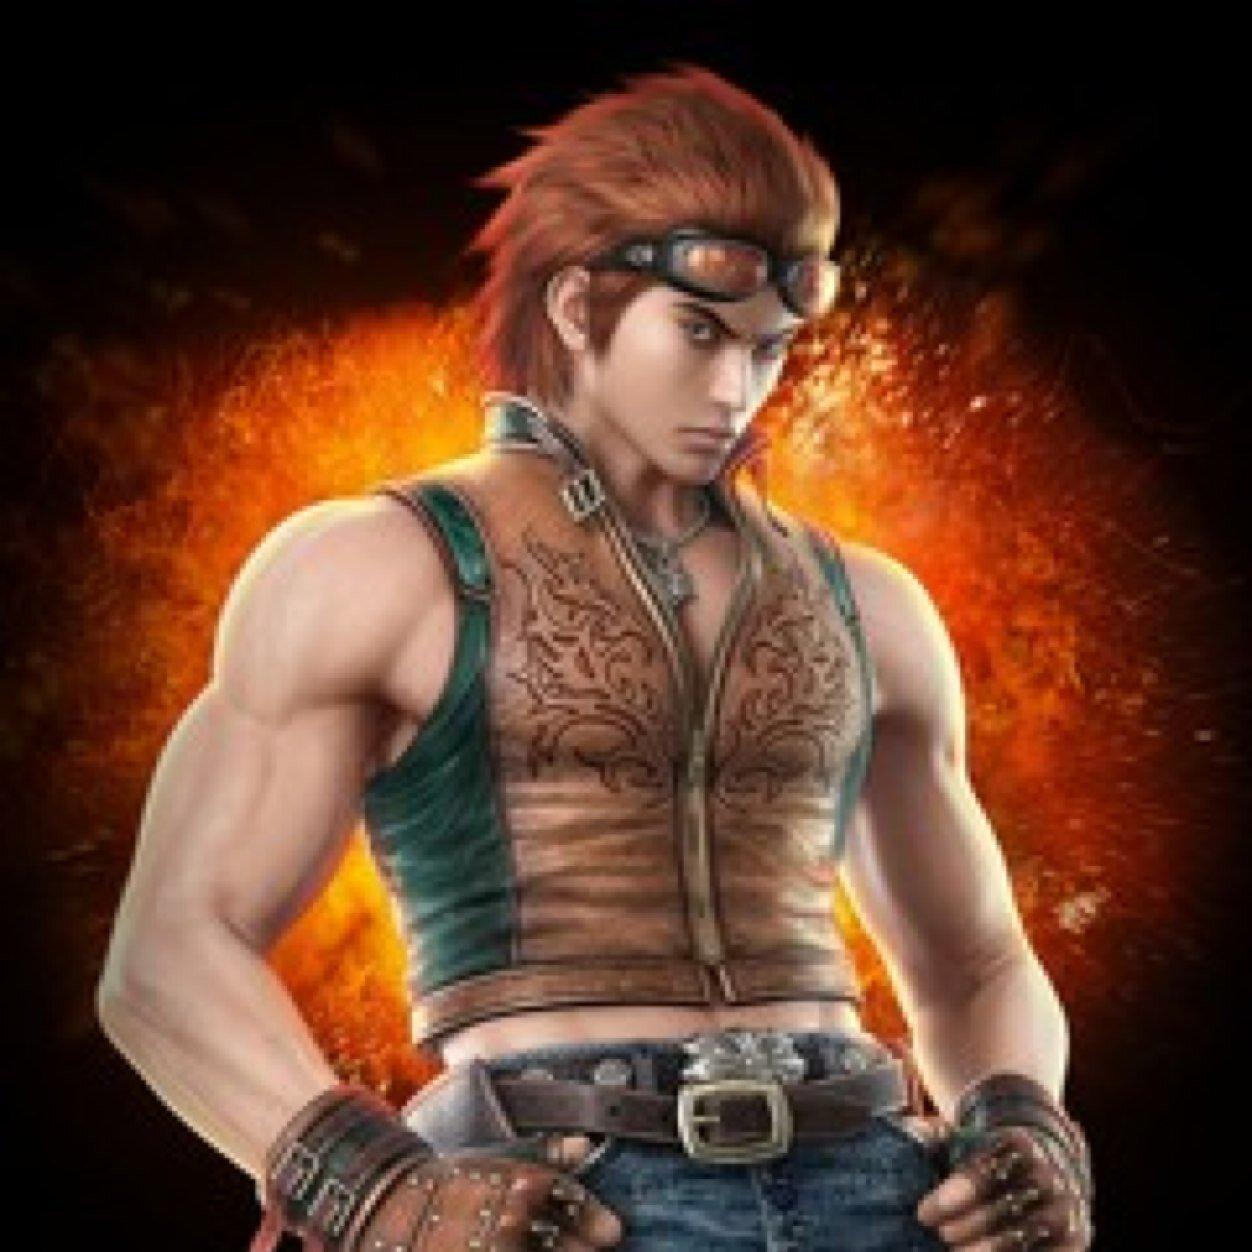 Tekken 6 Hwoarang Tekken6hwoarang Twitter